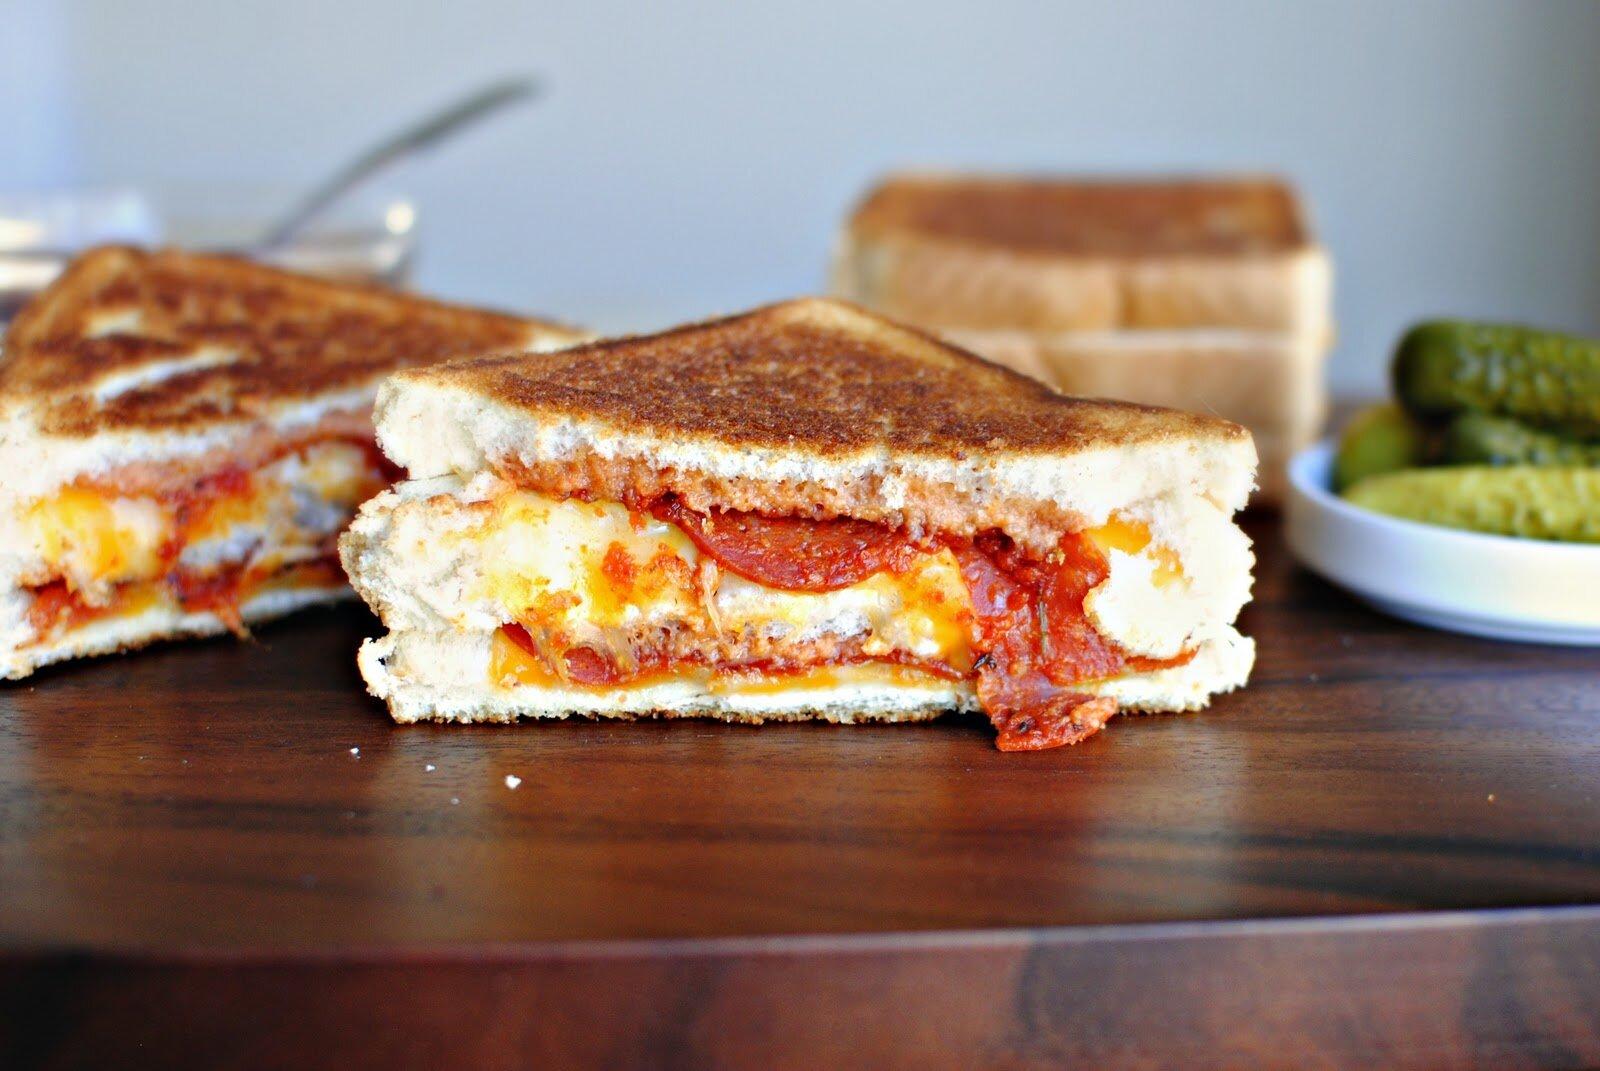 Sandwich phô mai